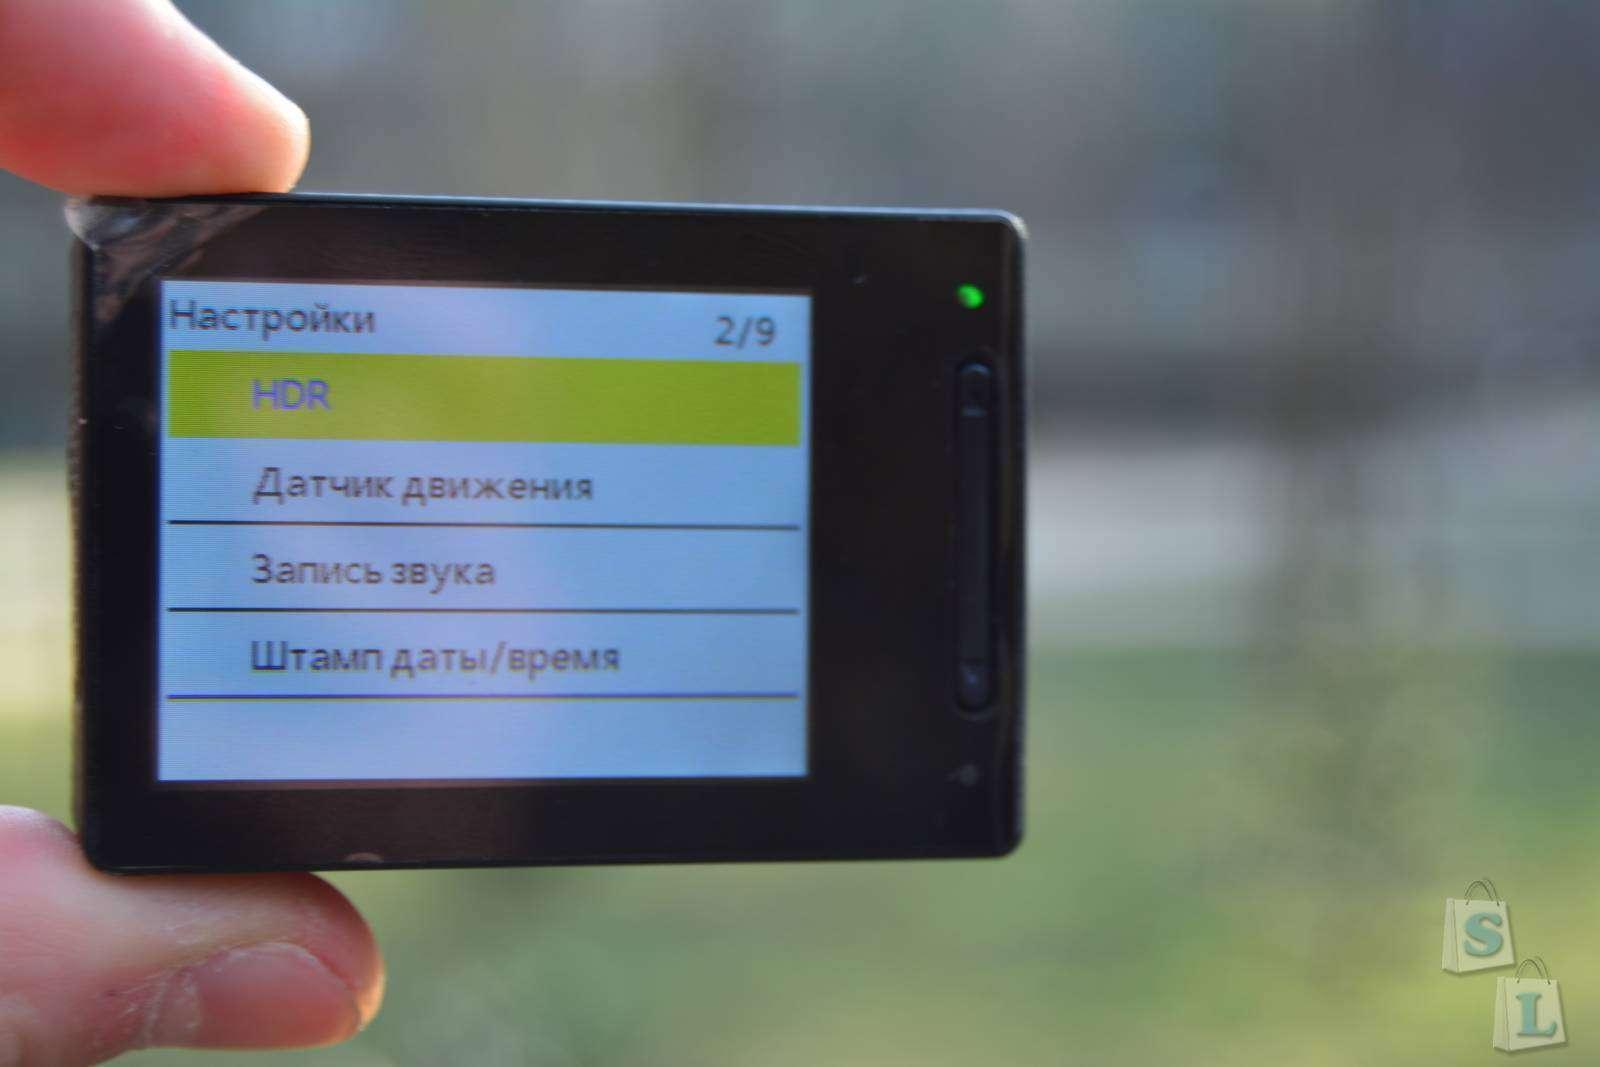 GearBest: Отличная,бюджетная экшн камера за